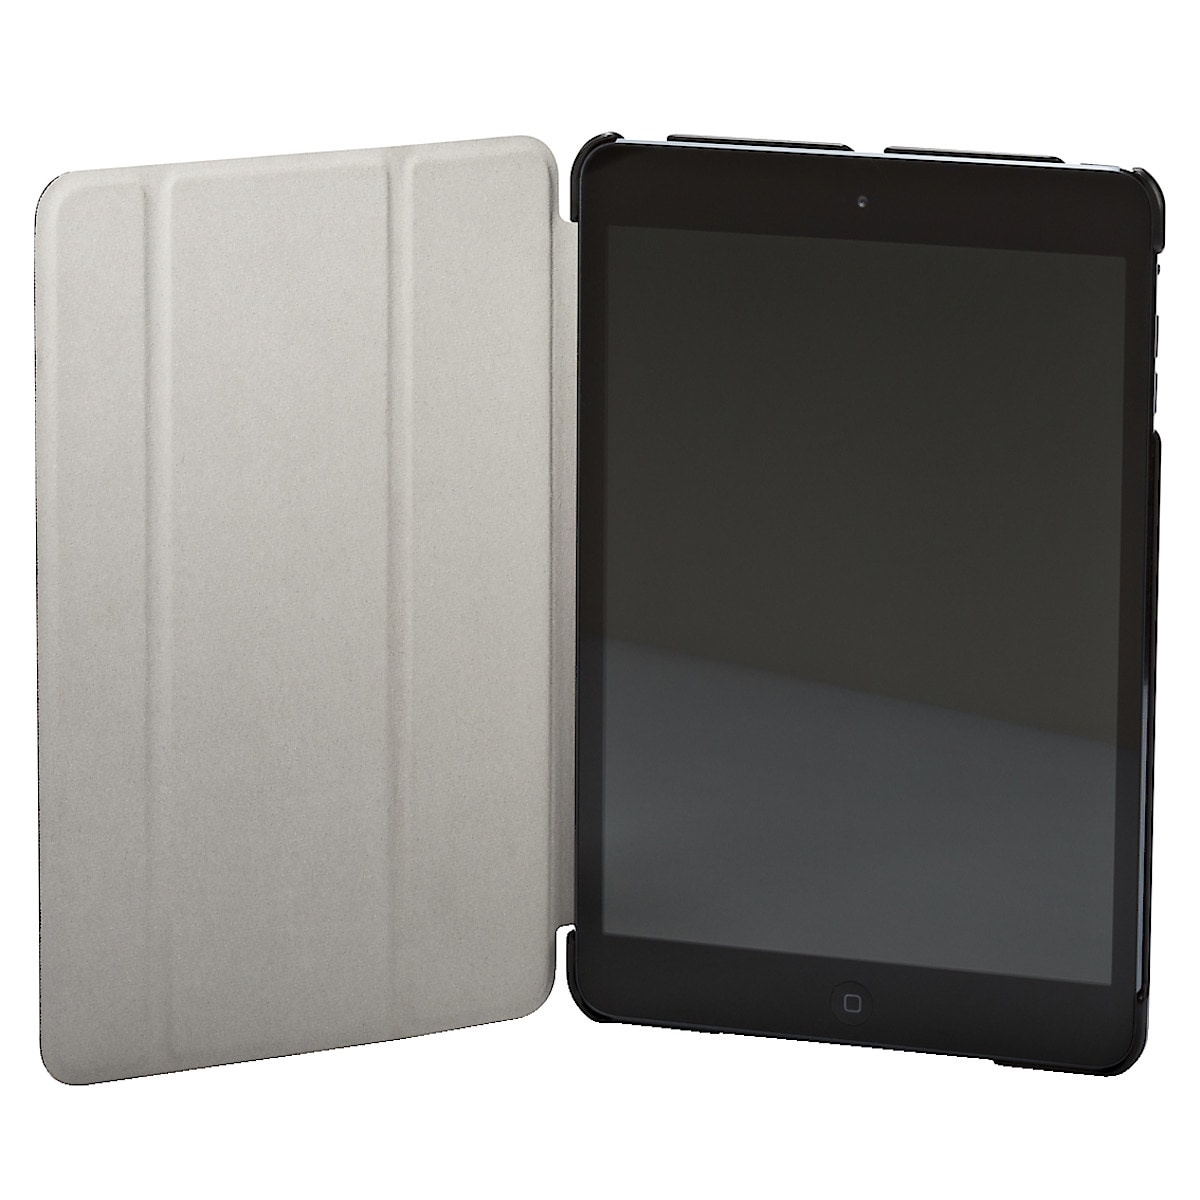 Schutzhülle für iPad Mini, Acme Made